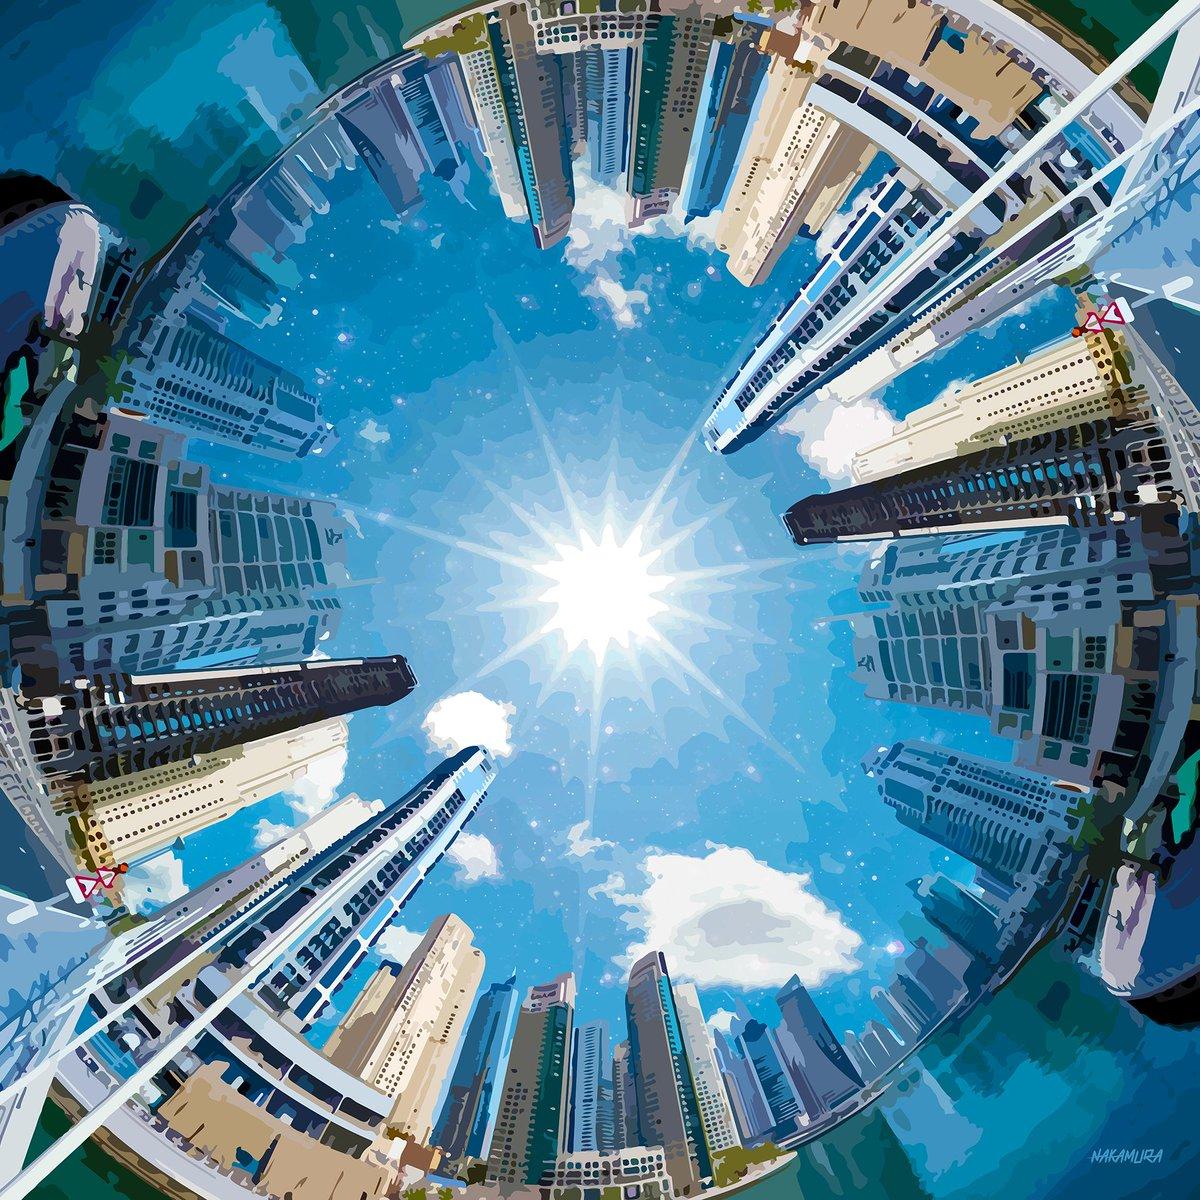 Keep Looking Up #Buidlings #City #Cityscape #Colorful #Fisheye #Nakamura #Sky #Sphere #Sunny https://t.co/hYVJ9RkyoX https://t.co/3Qk3YfauVE